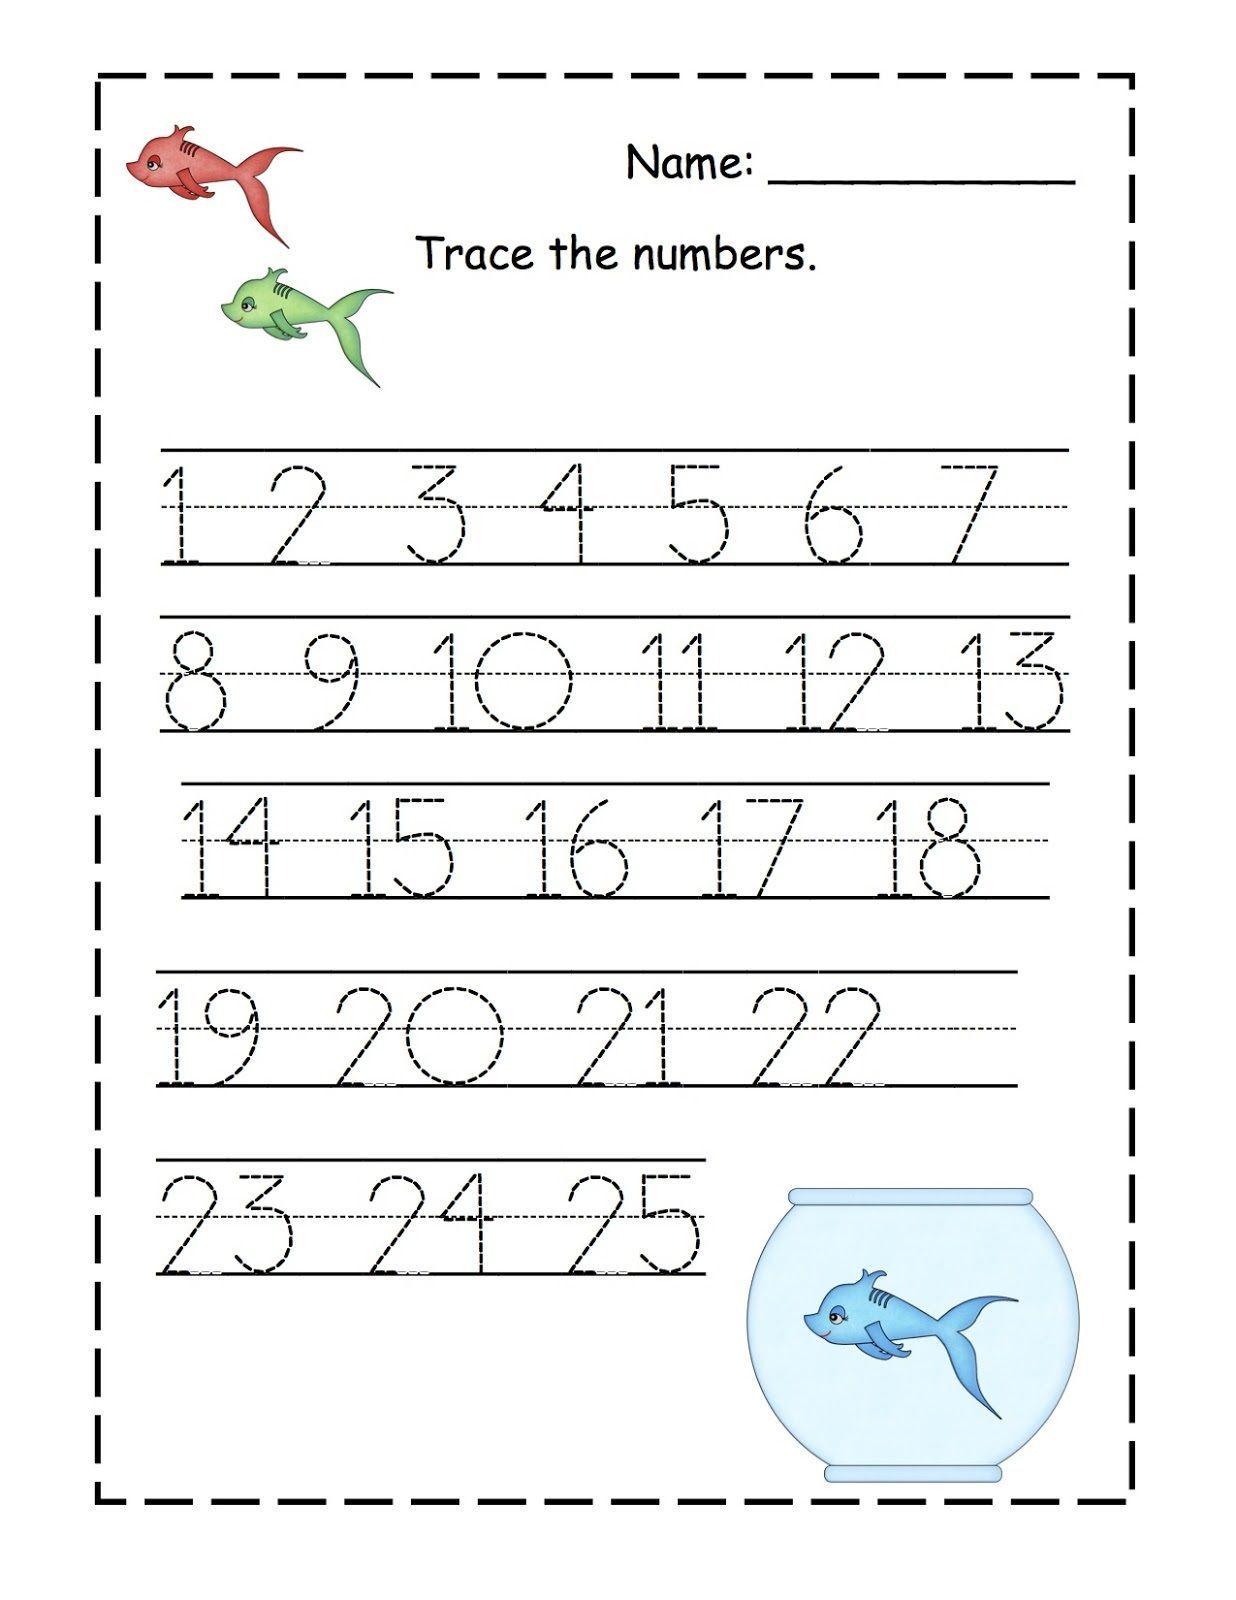 Printables Traceable Numbers Worksheets 1 20 Traceable